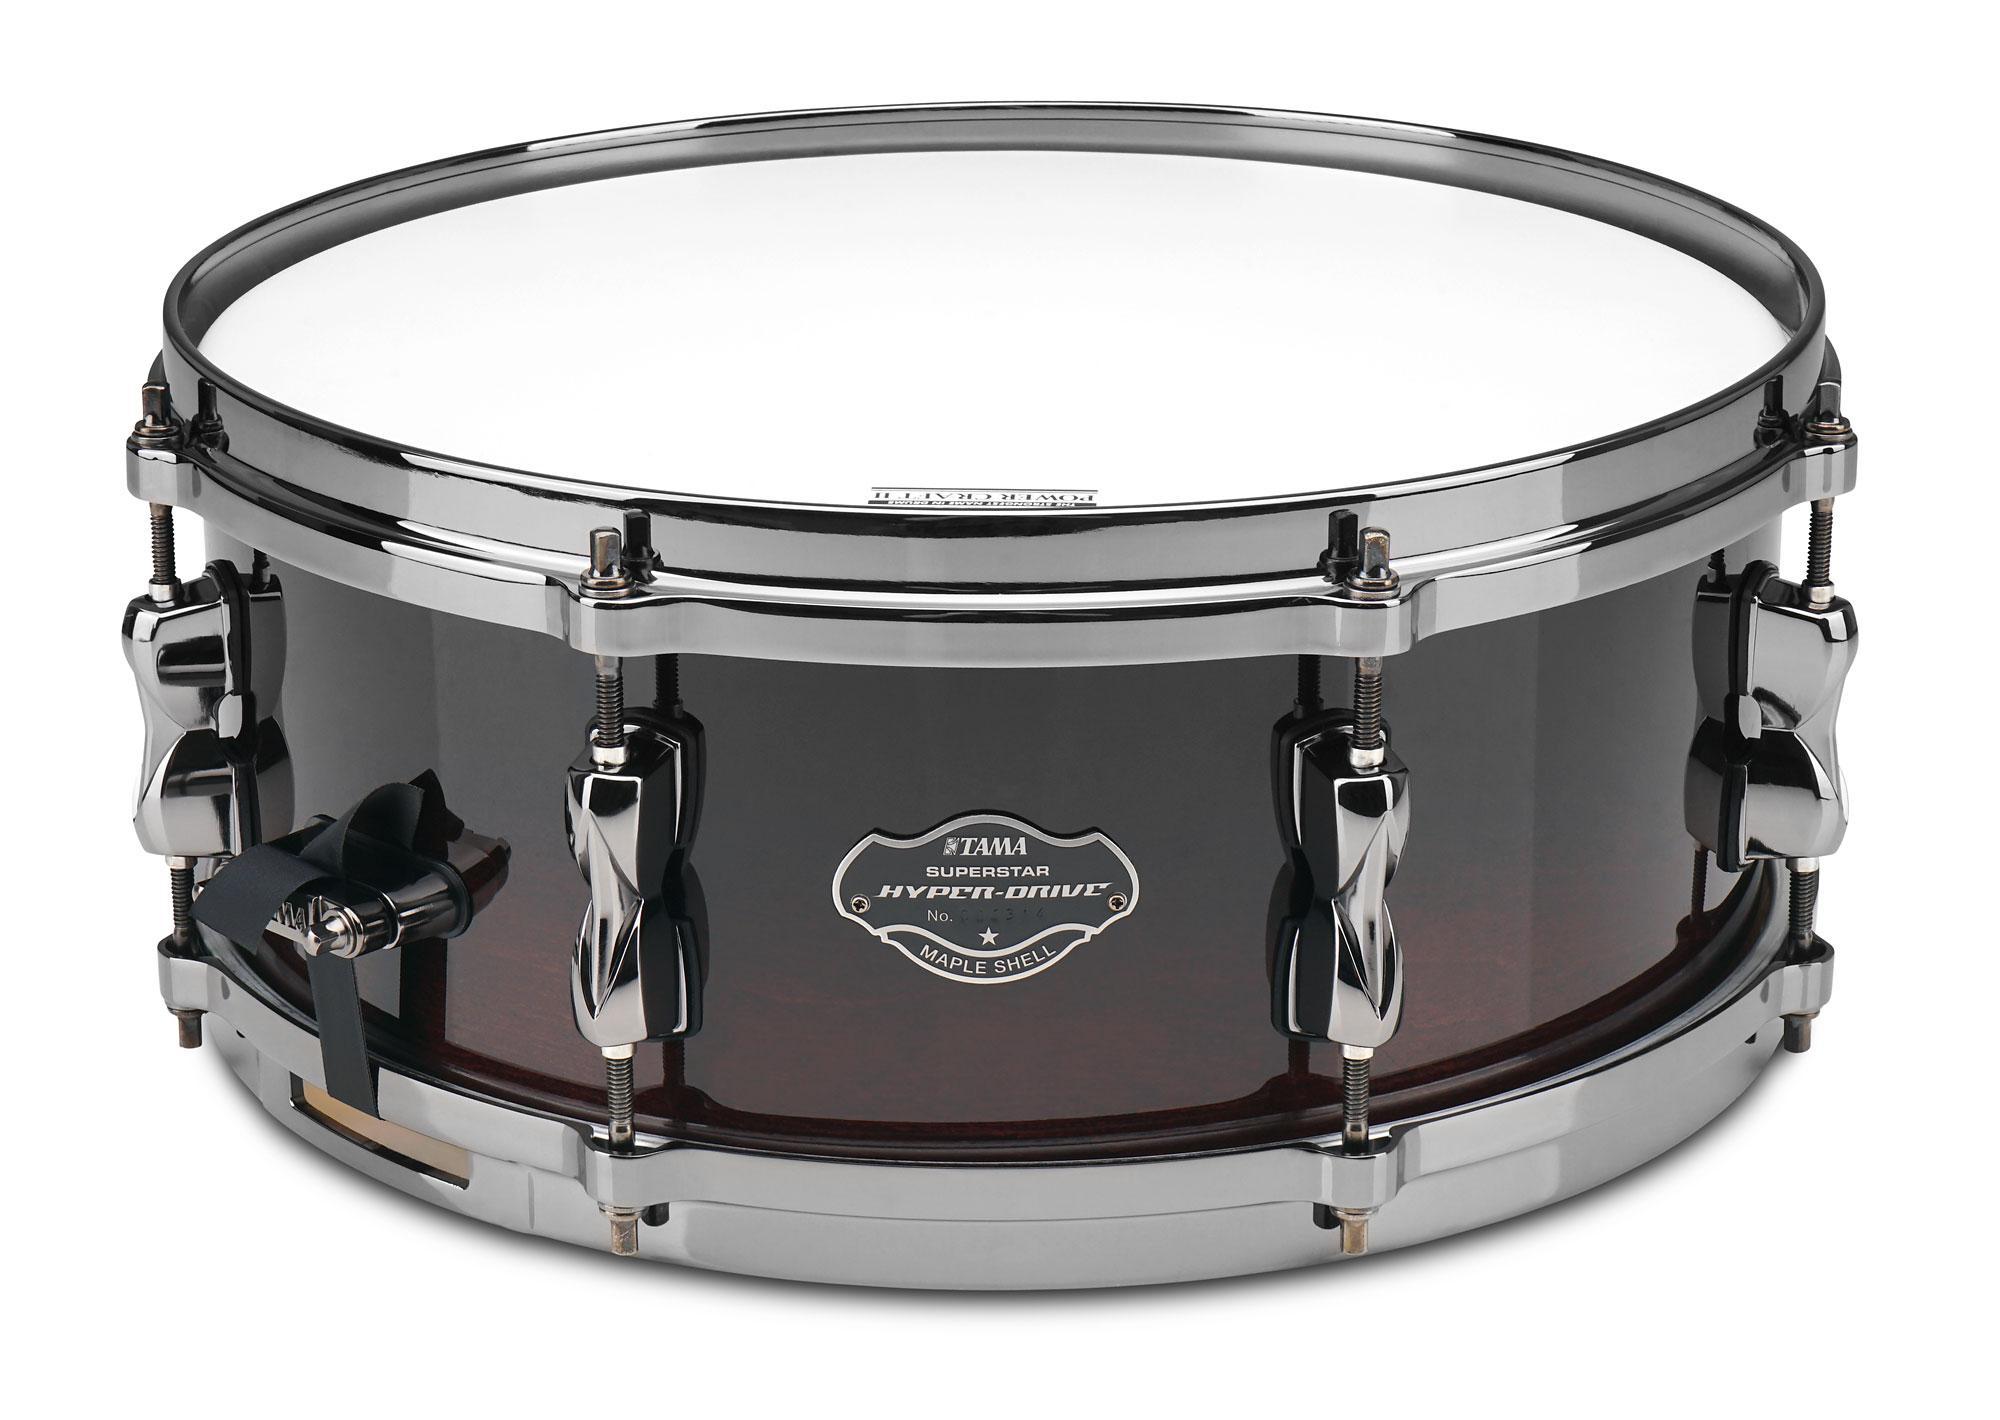 Tama MLS55BN DMF 14' x 5,5' Snare Drum Dark Mocha Fade